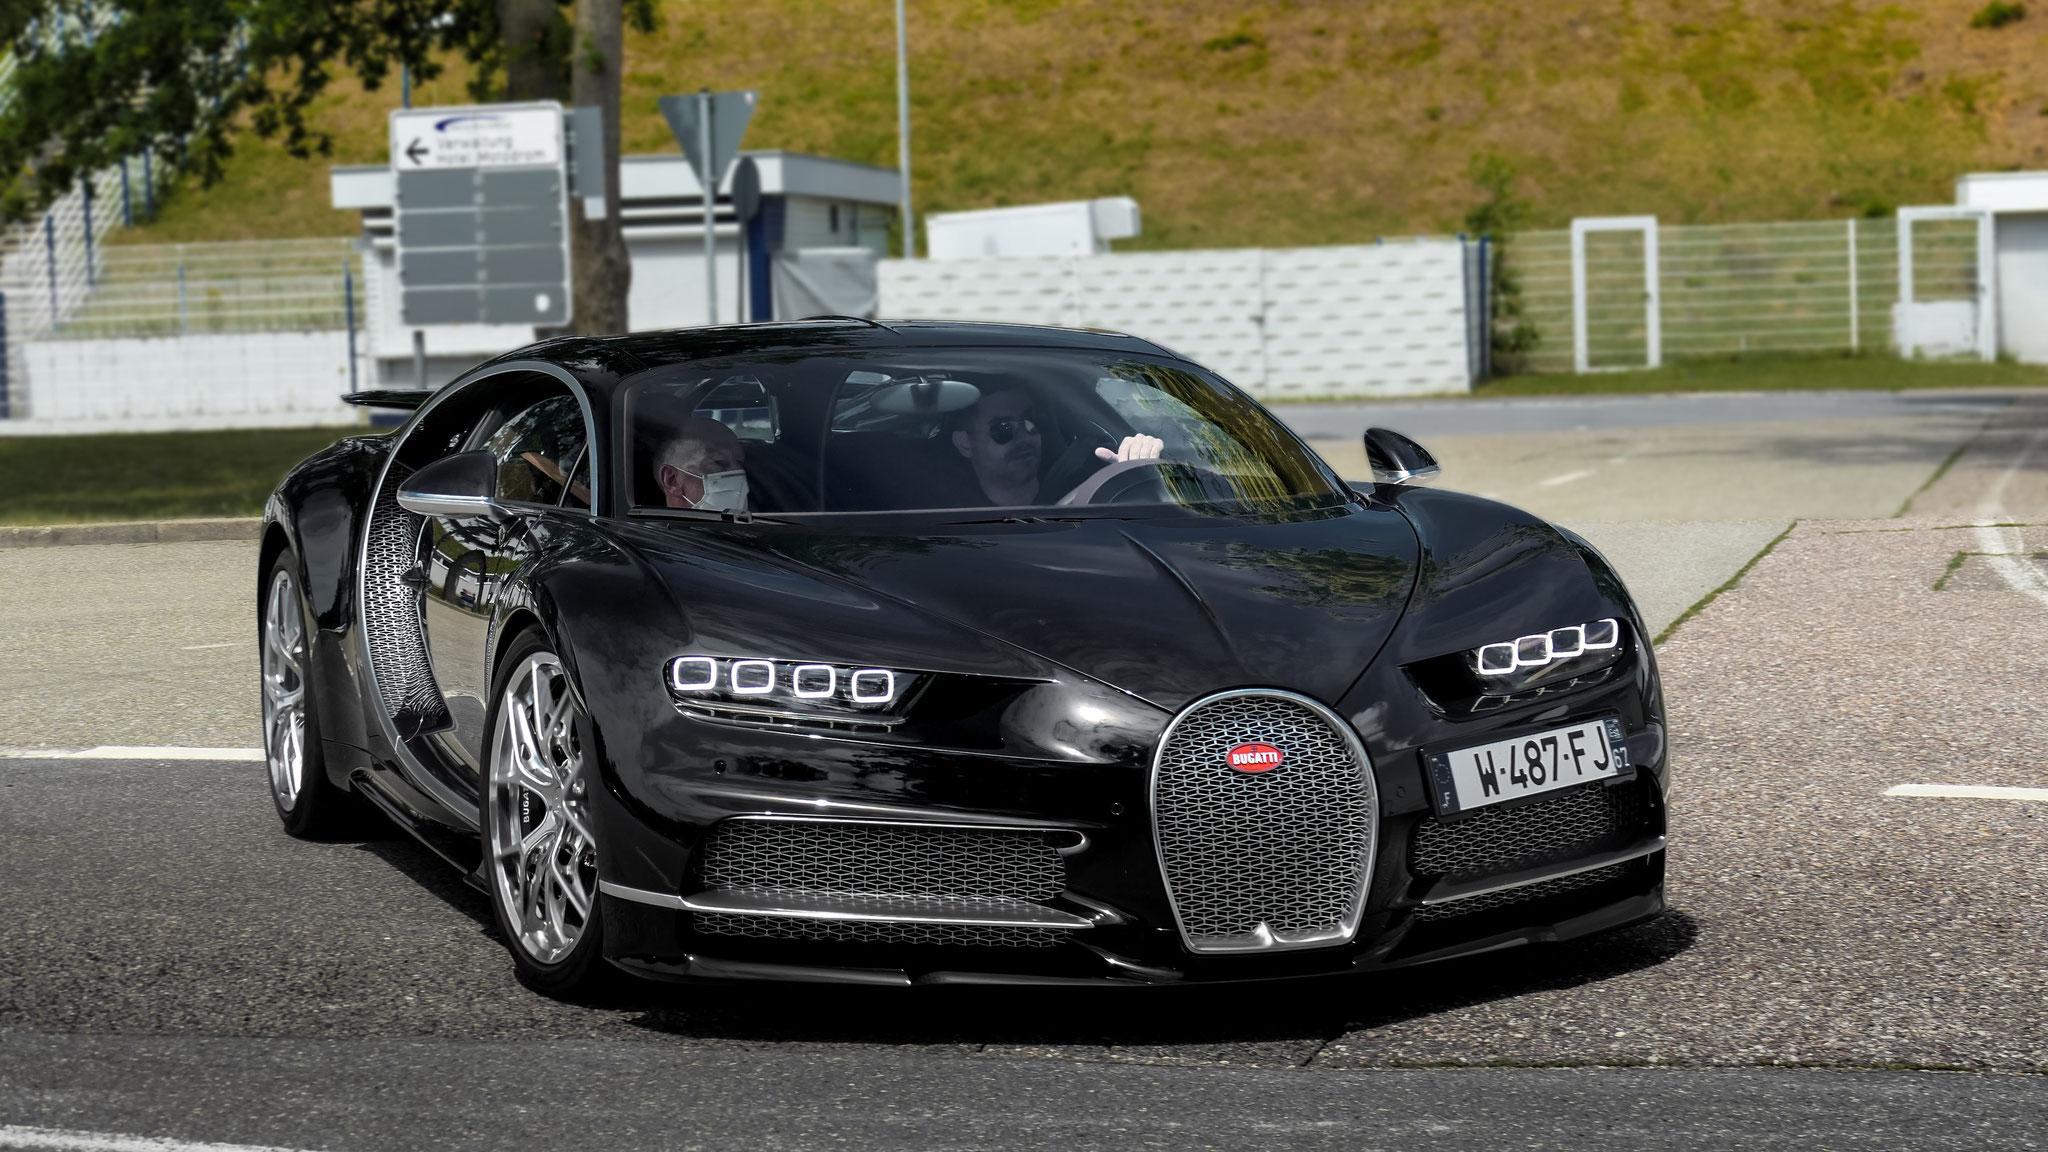 Bugatti Chiron Sport - W-487-FJ-67 (FRA)